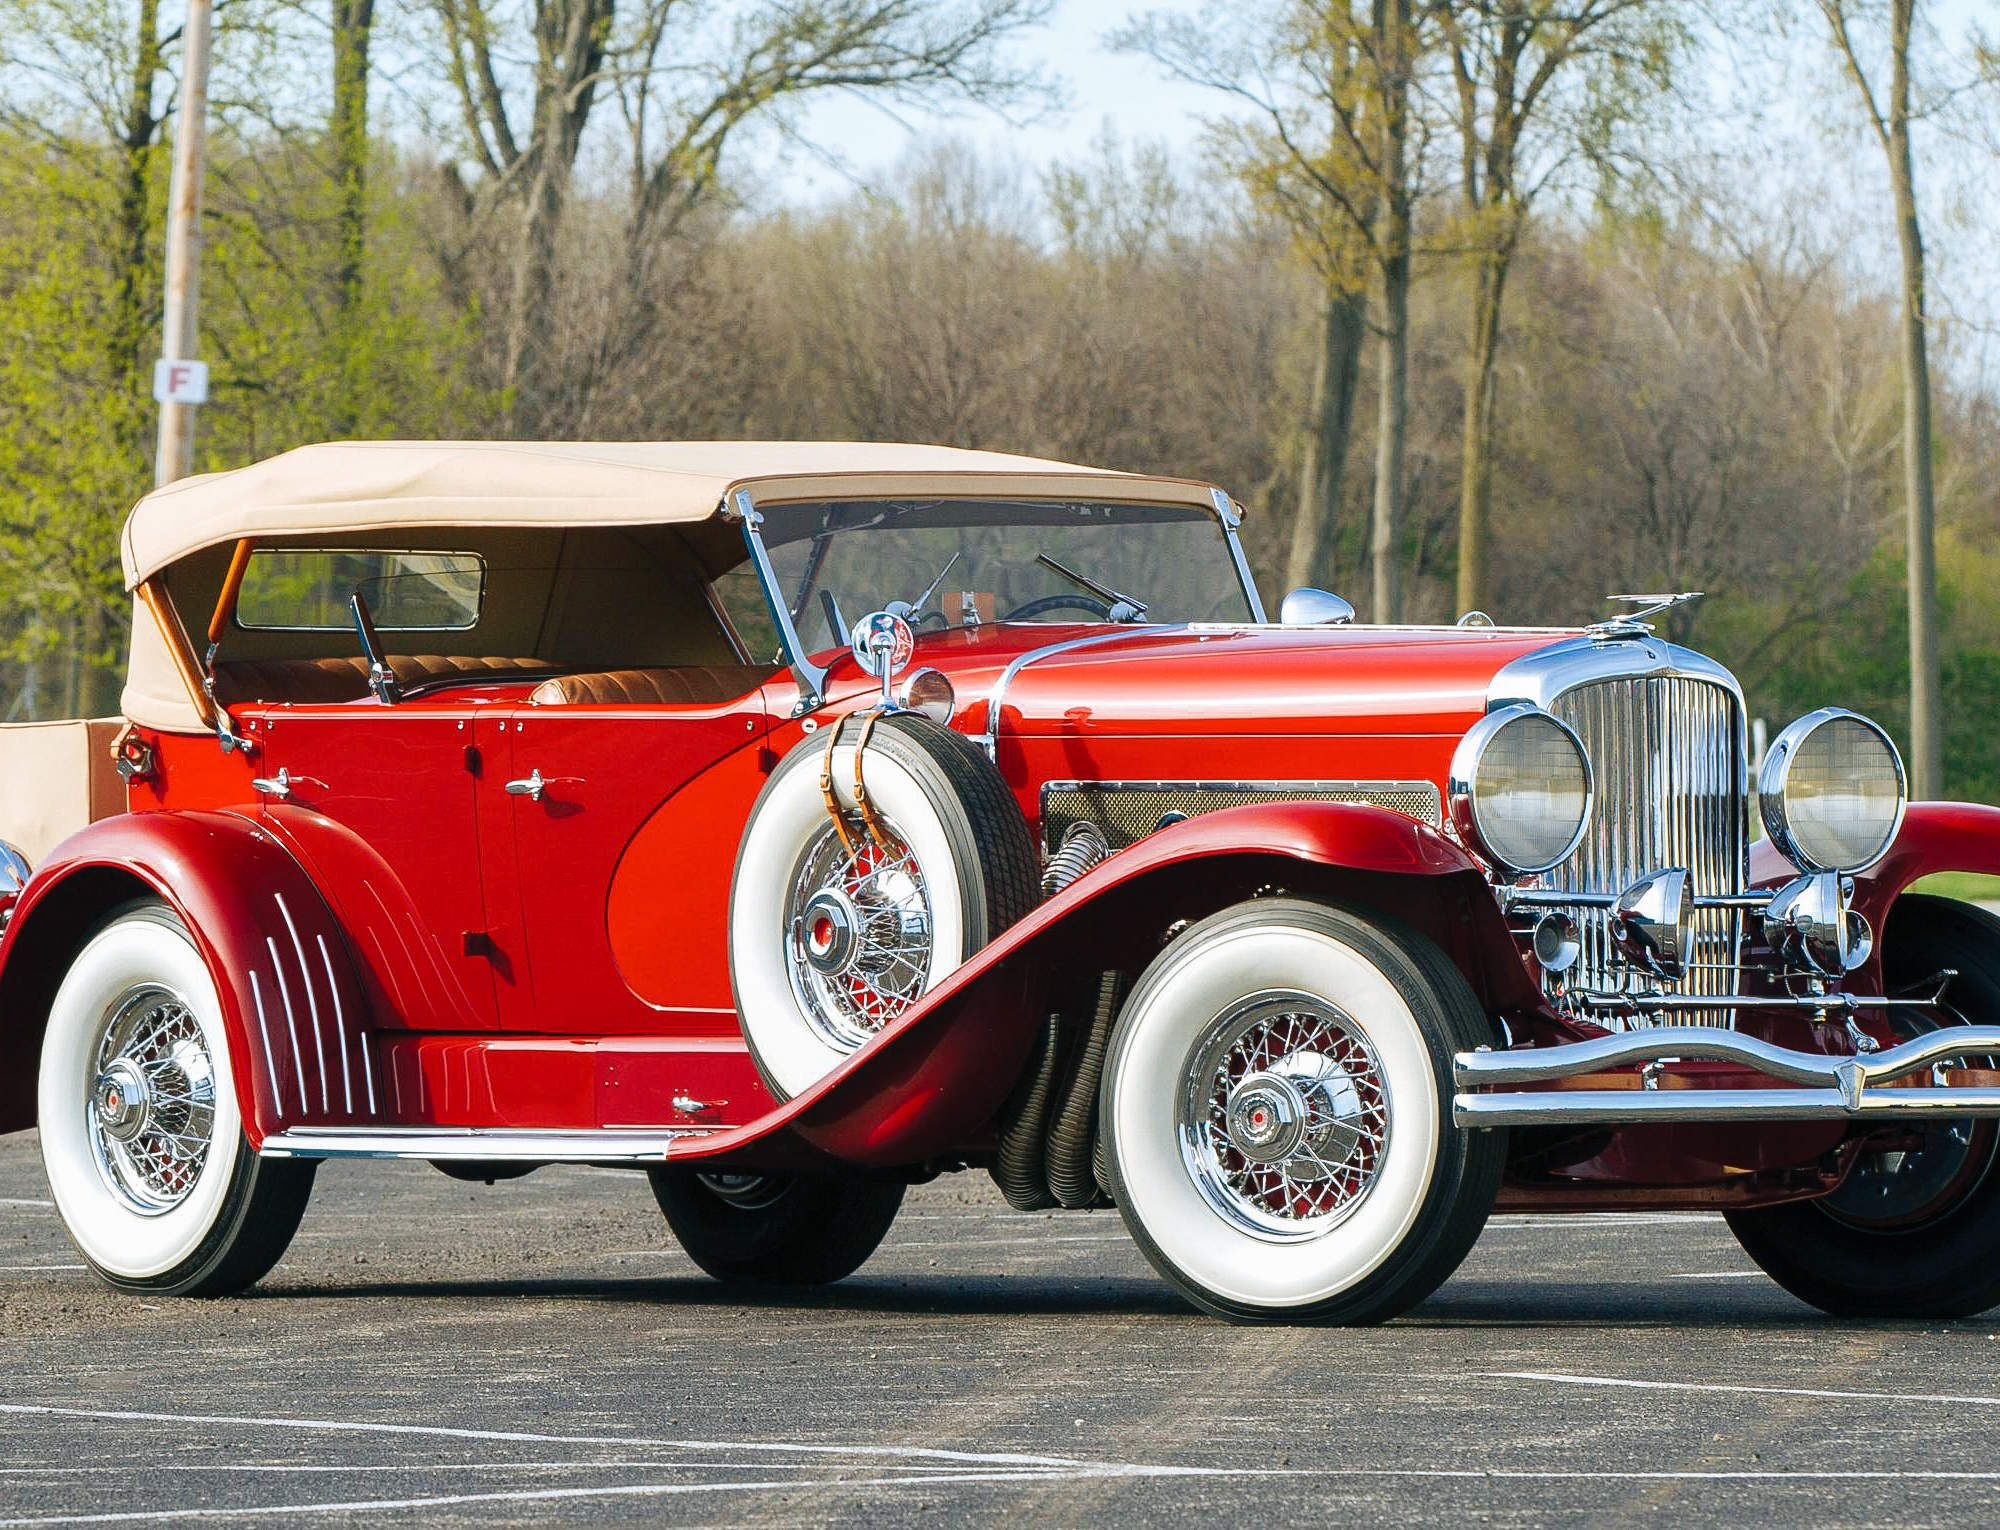 11 Extinct American Car Brands We Wish Would Return | Car brands ...